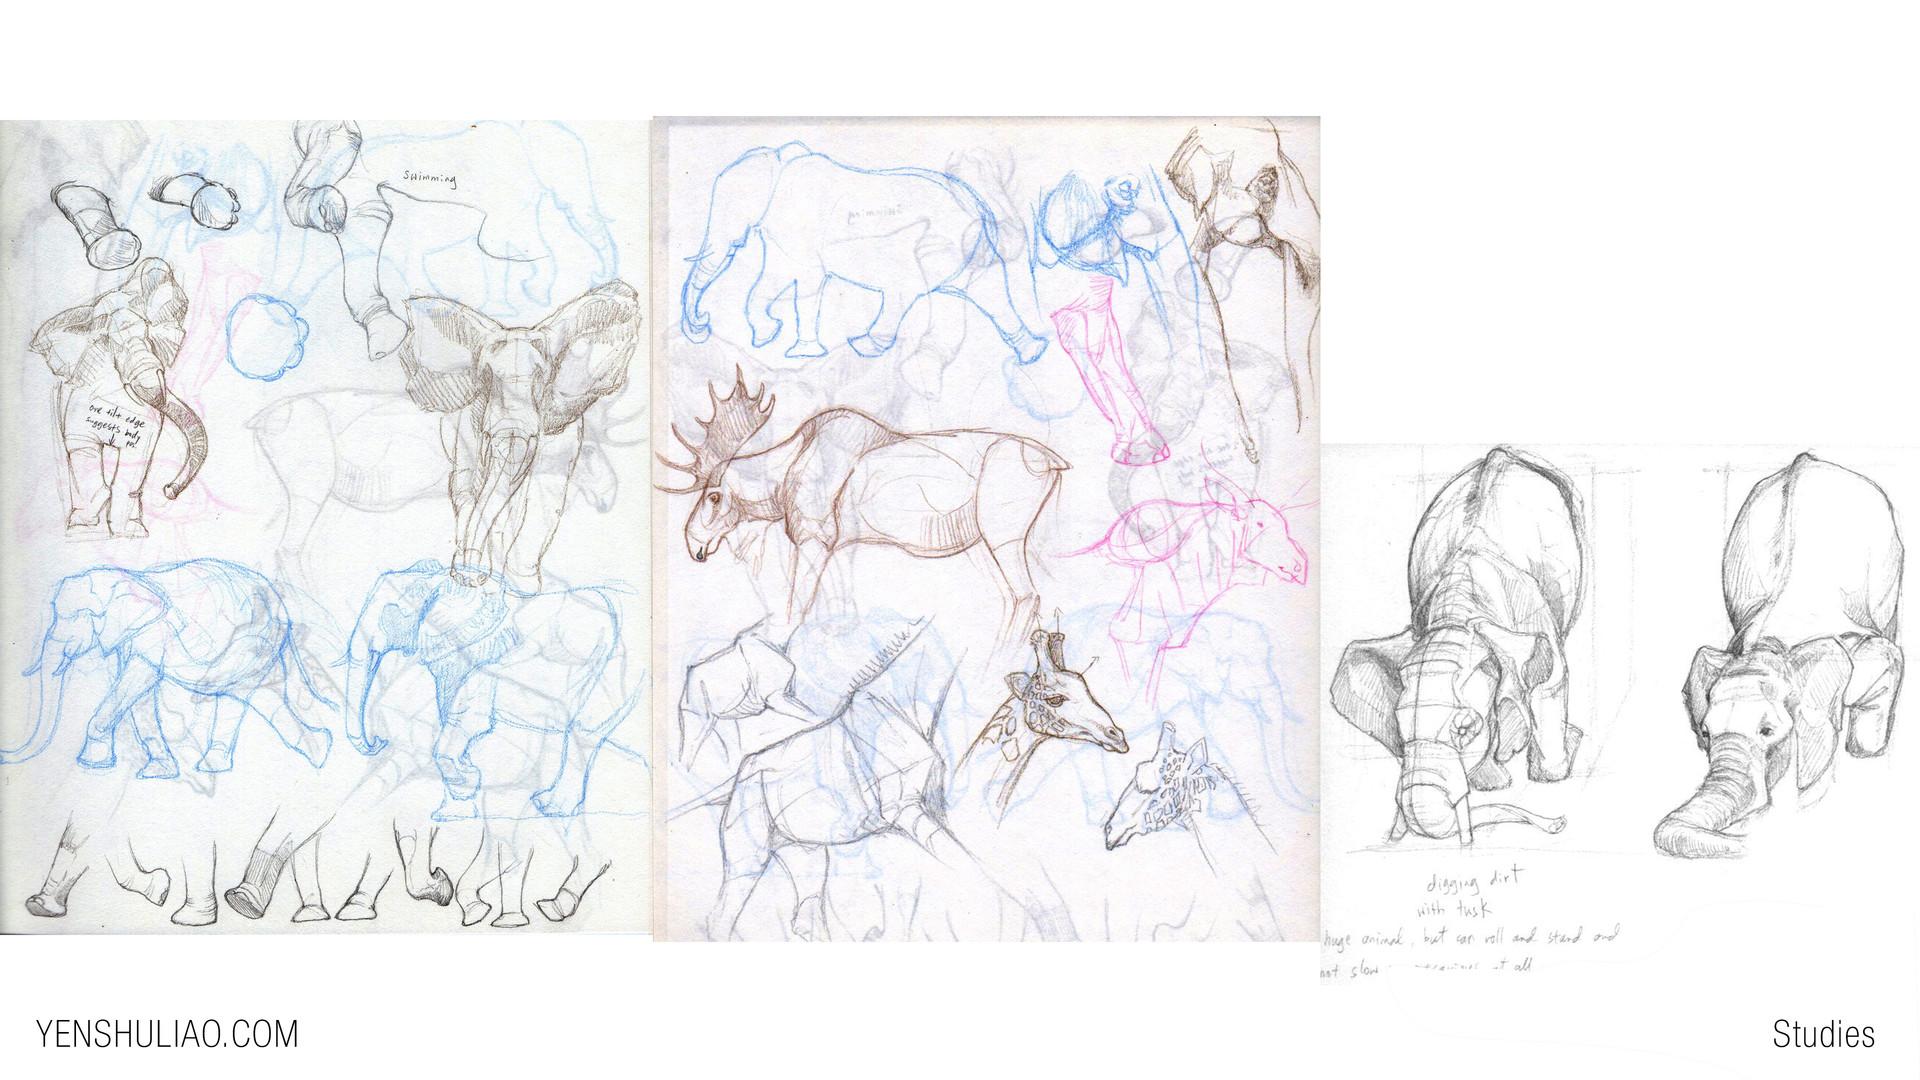 Yen shu liao creature concept art study elephant